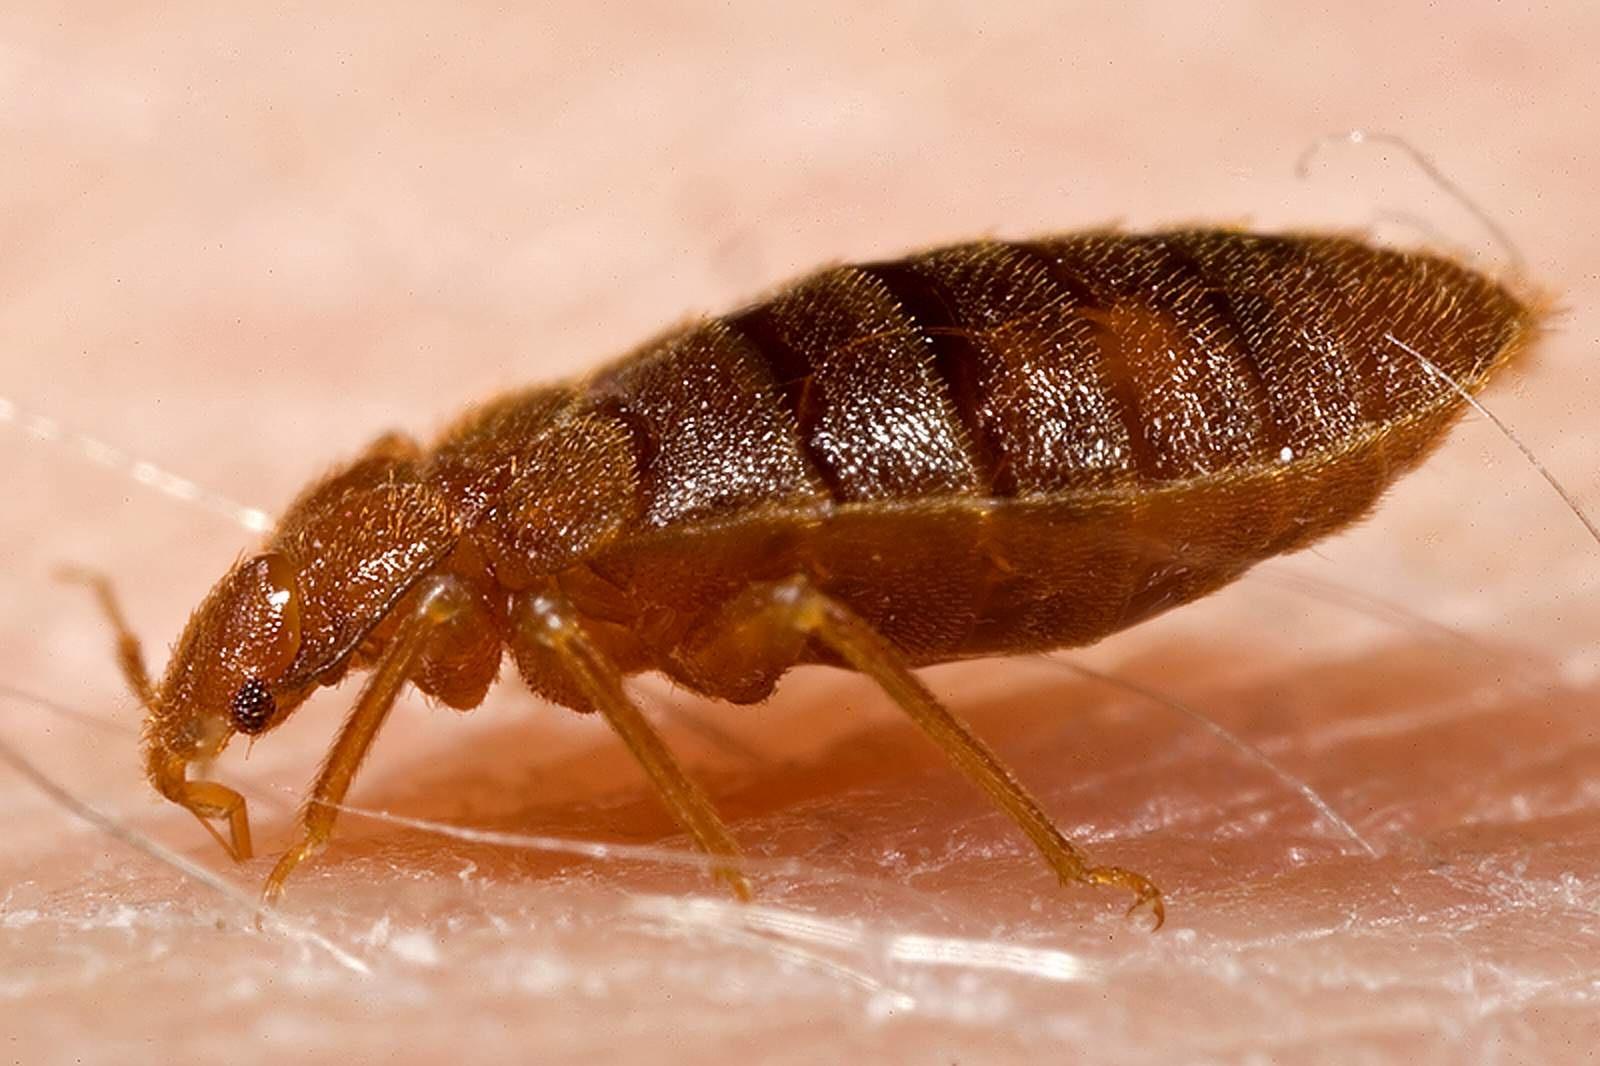 Got Bedbugs The Co2 Bedbug Trap